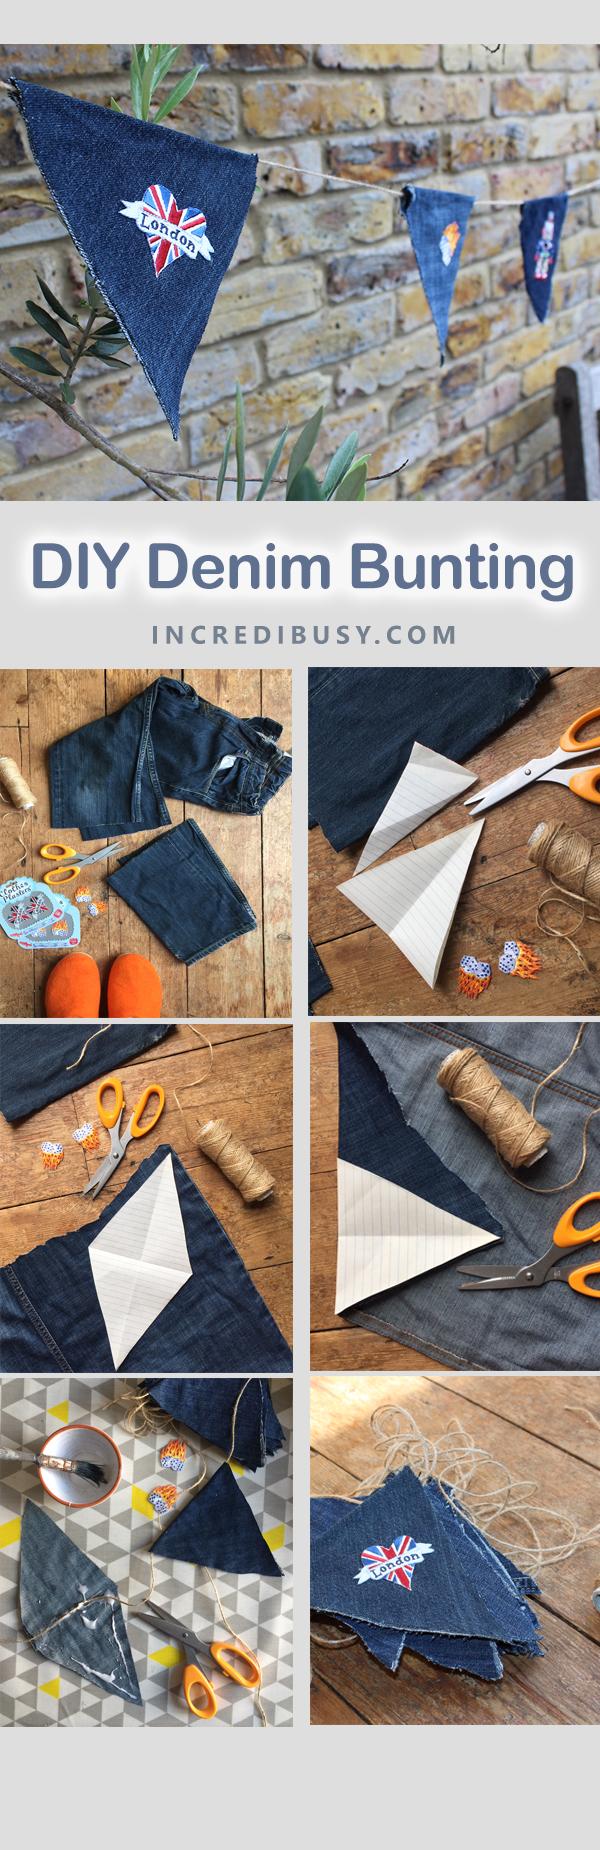 DIY-Denim-Bunting-steps